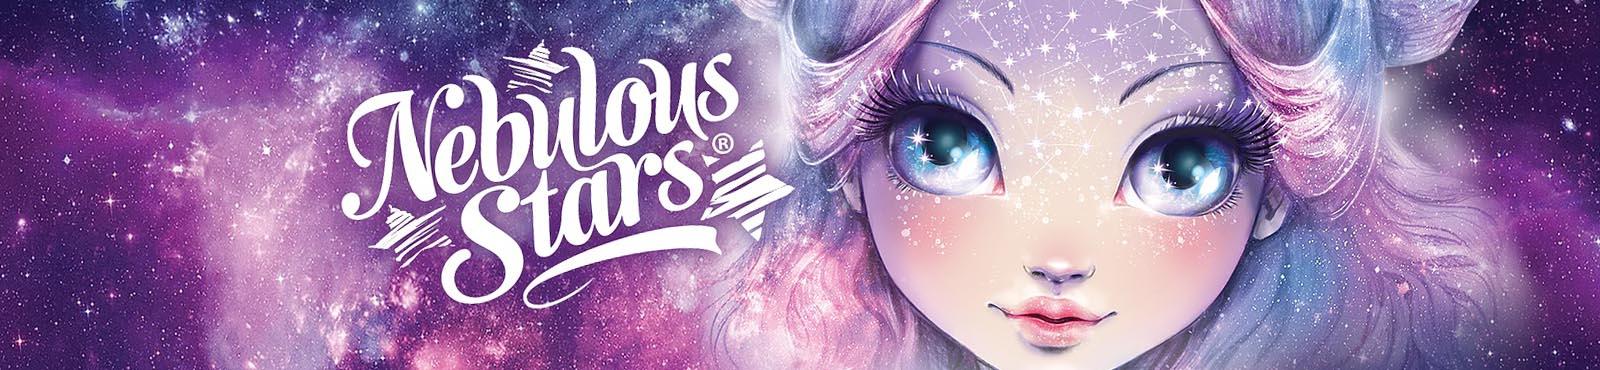 marca Nebulous Stars